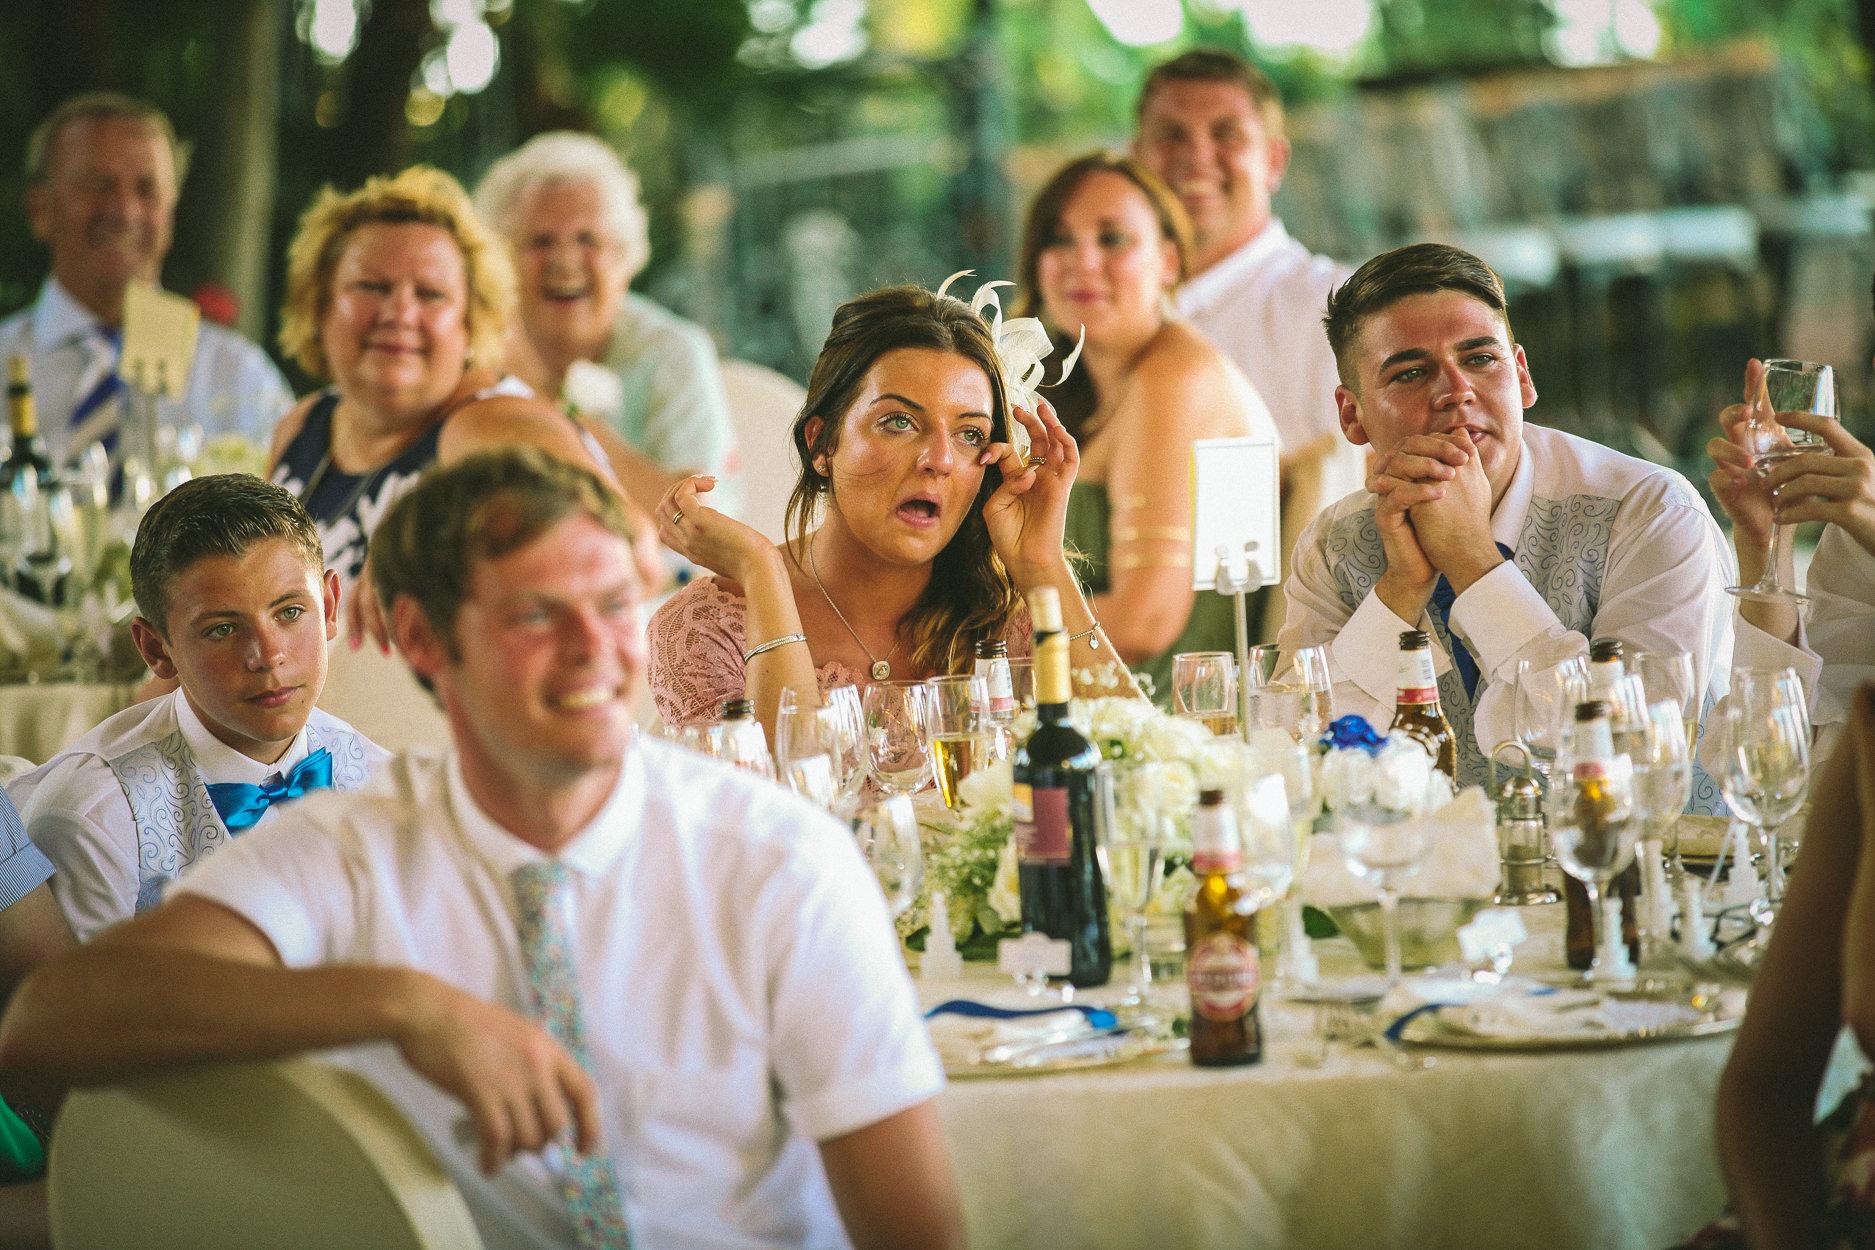 Amalfi-Coast-wedding-venue-Wedding-Photography-Villa Antiche Mura-Sorrento-Italy-21